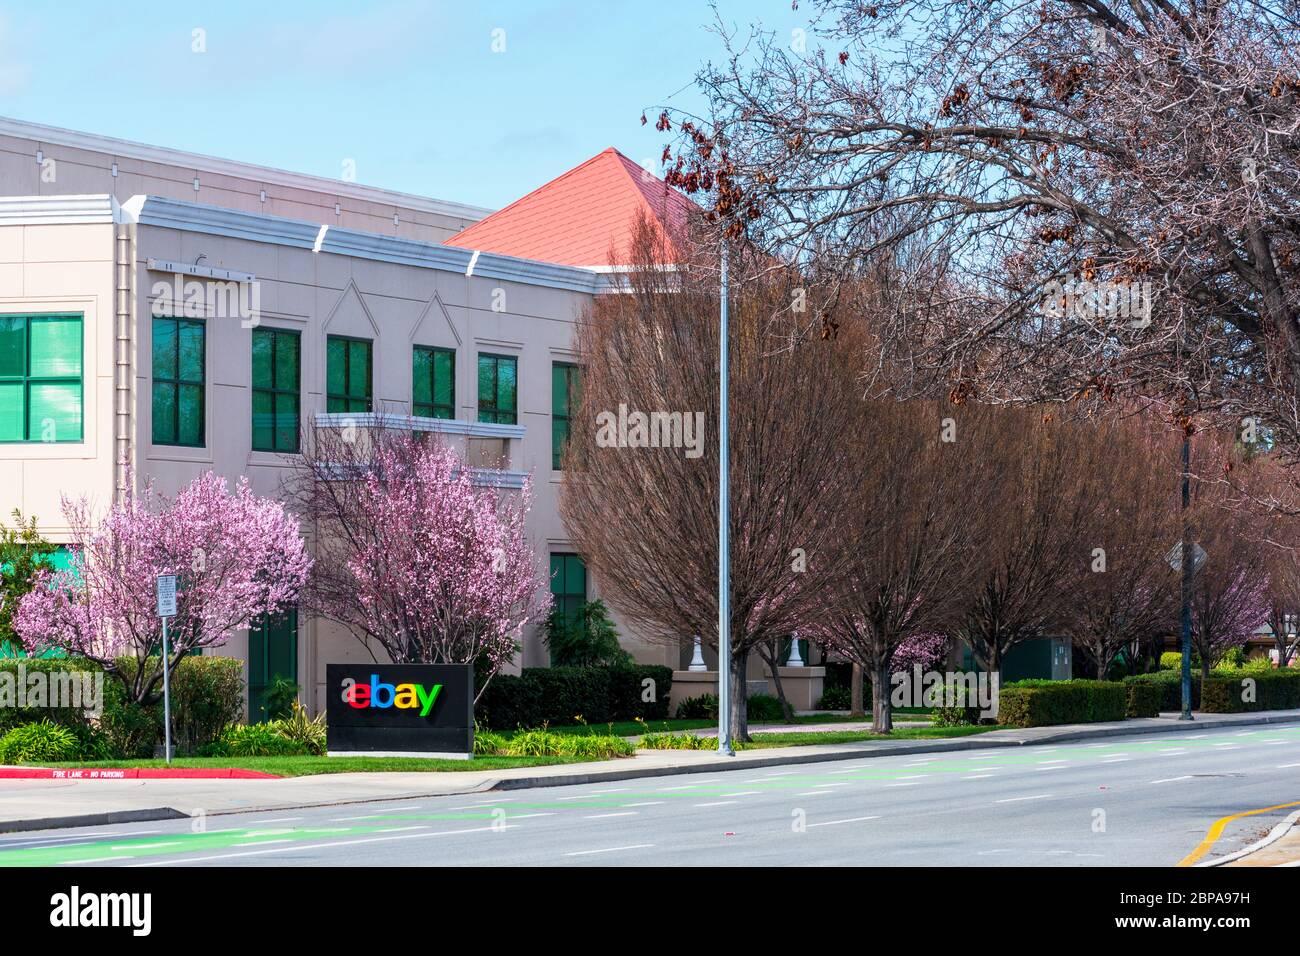 Ebay Corporate Hq Campus In Silicon Valley Ebay Inc Is A Multinational E Commerce Corporation San Jose California Usa 2020 Stock Photo Alamy